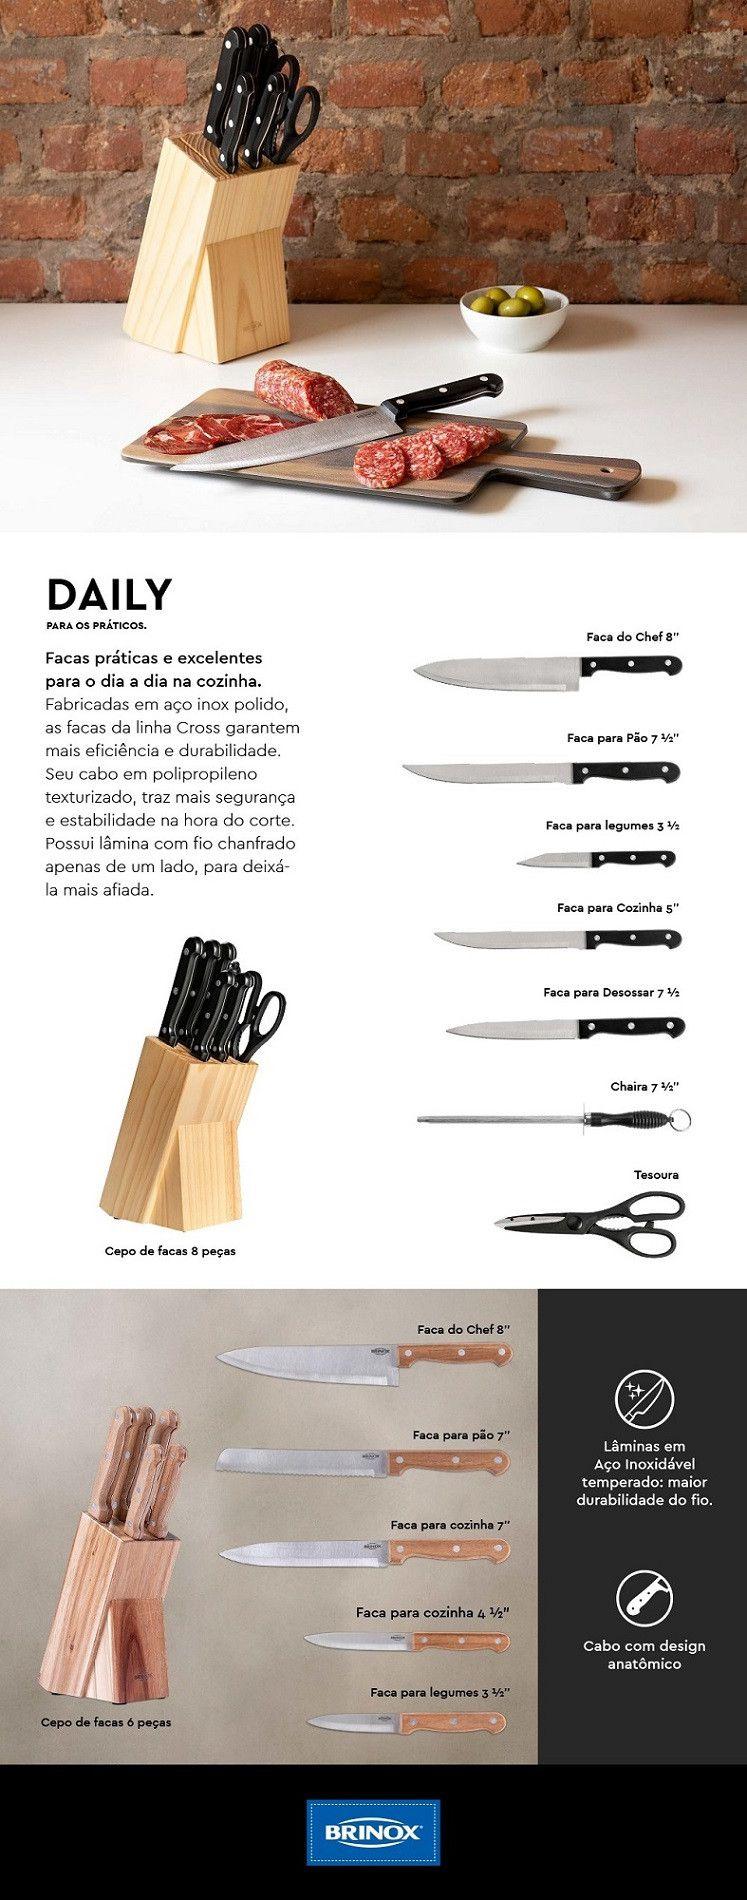 Conjunto de Facas Brinox Daily 2522/101 - 6 Peças